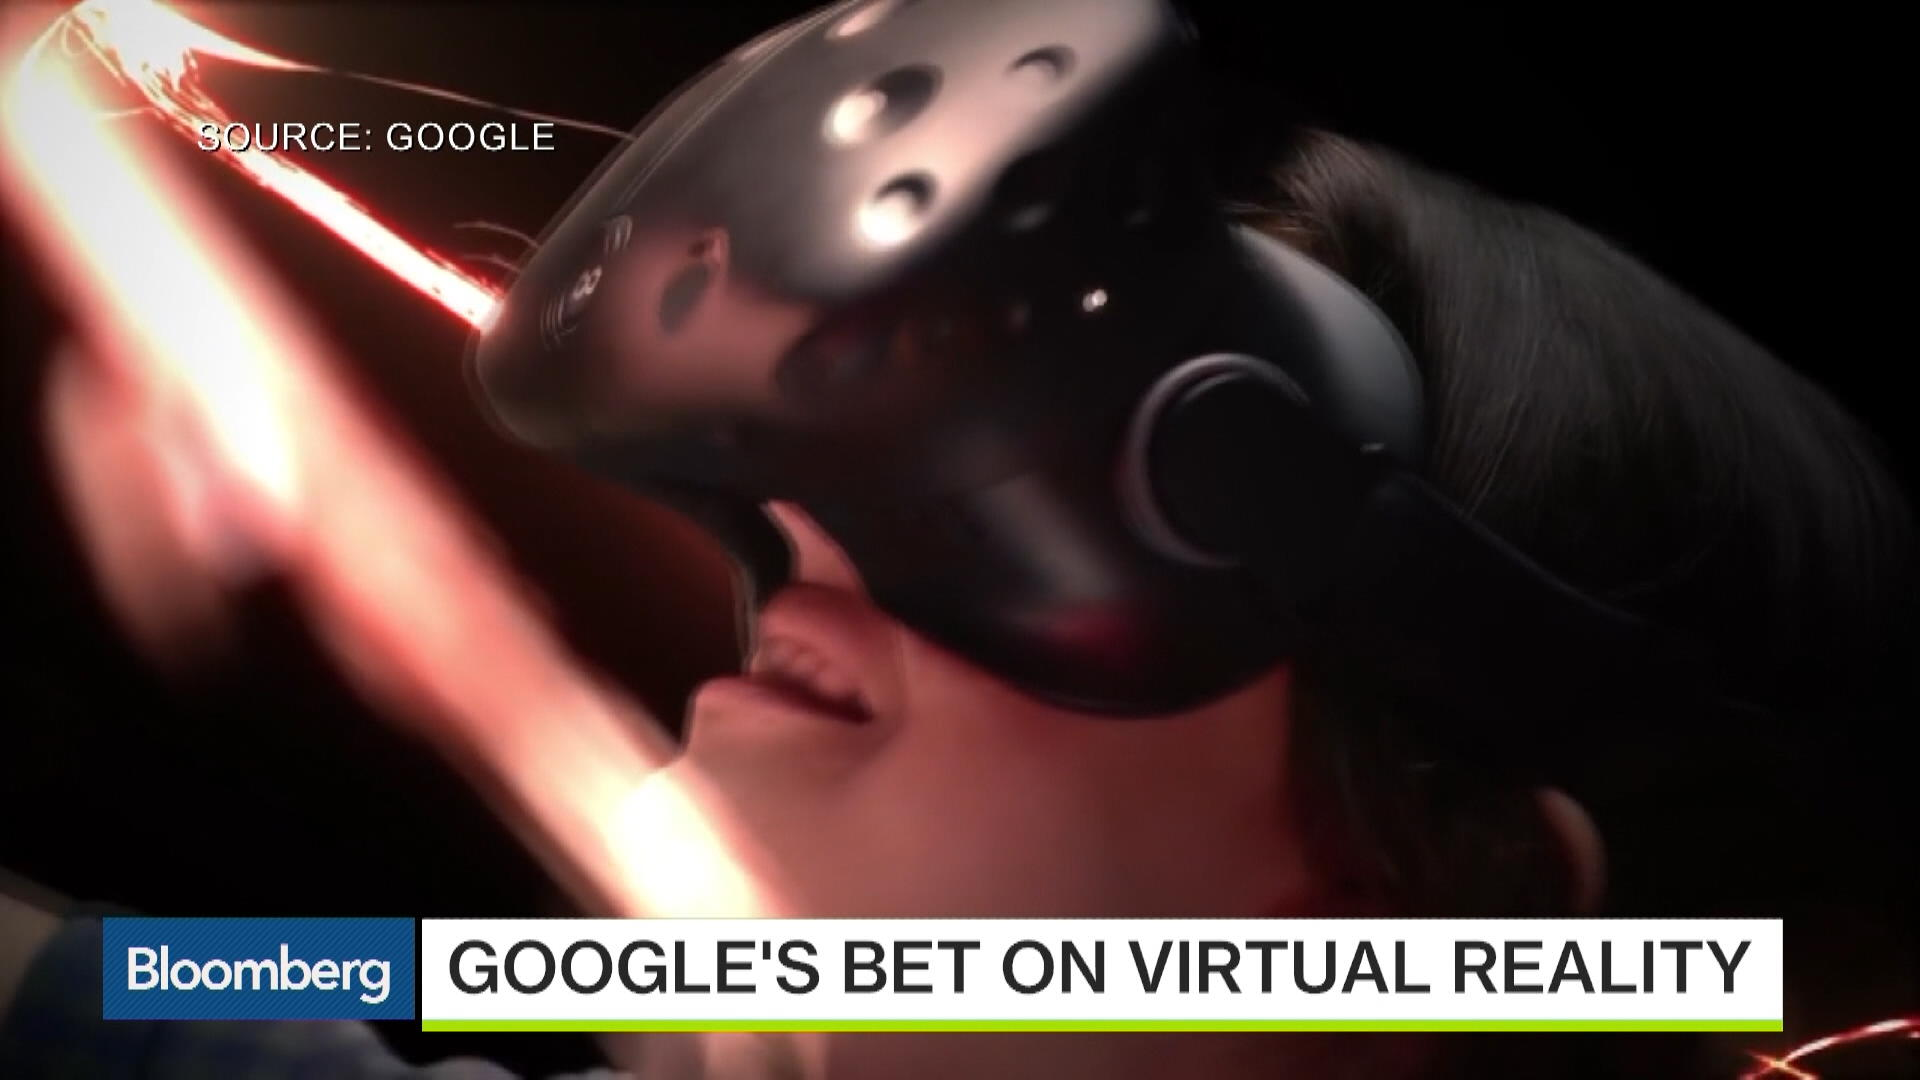 Google I/O, Facebook News Bias Probe: This Week in Tech